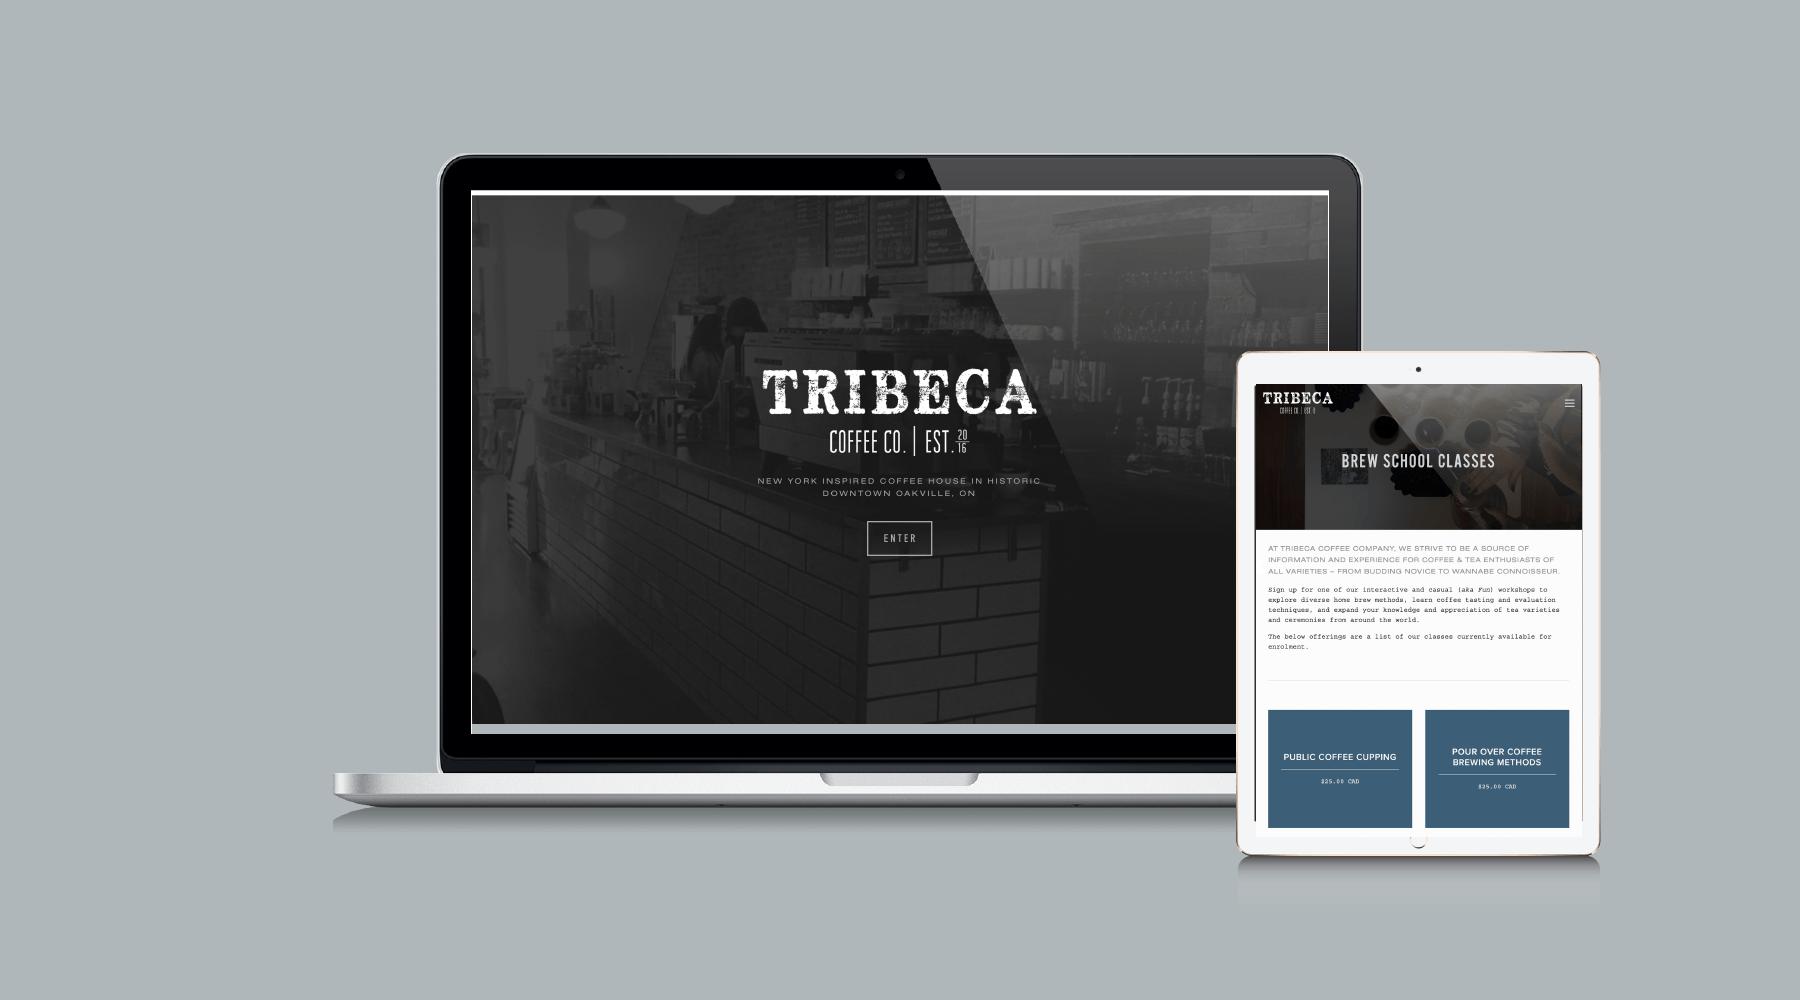 Tribeca Coffee Co.